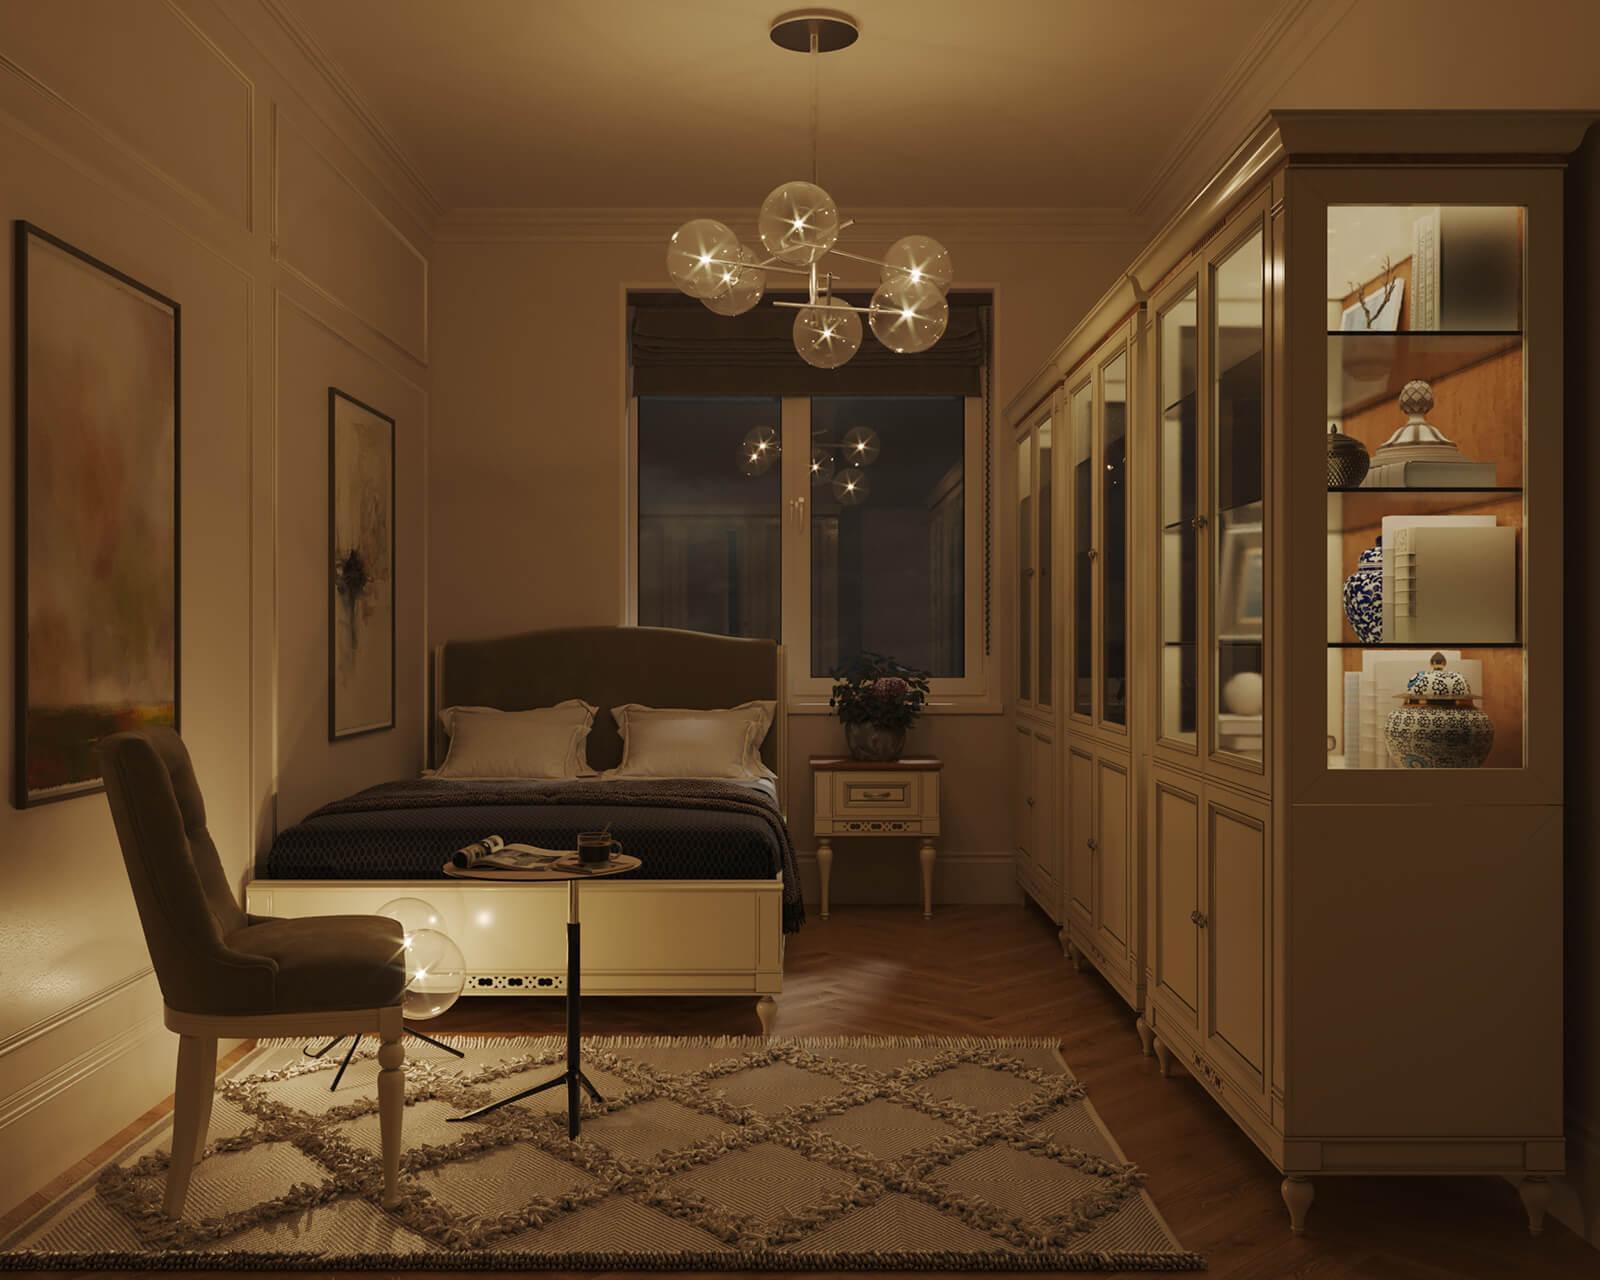 florence-guest-room-lighting-test (1)